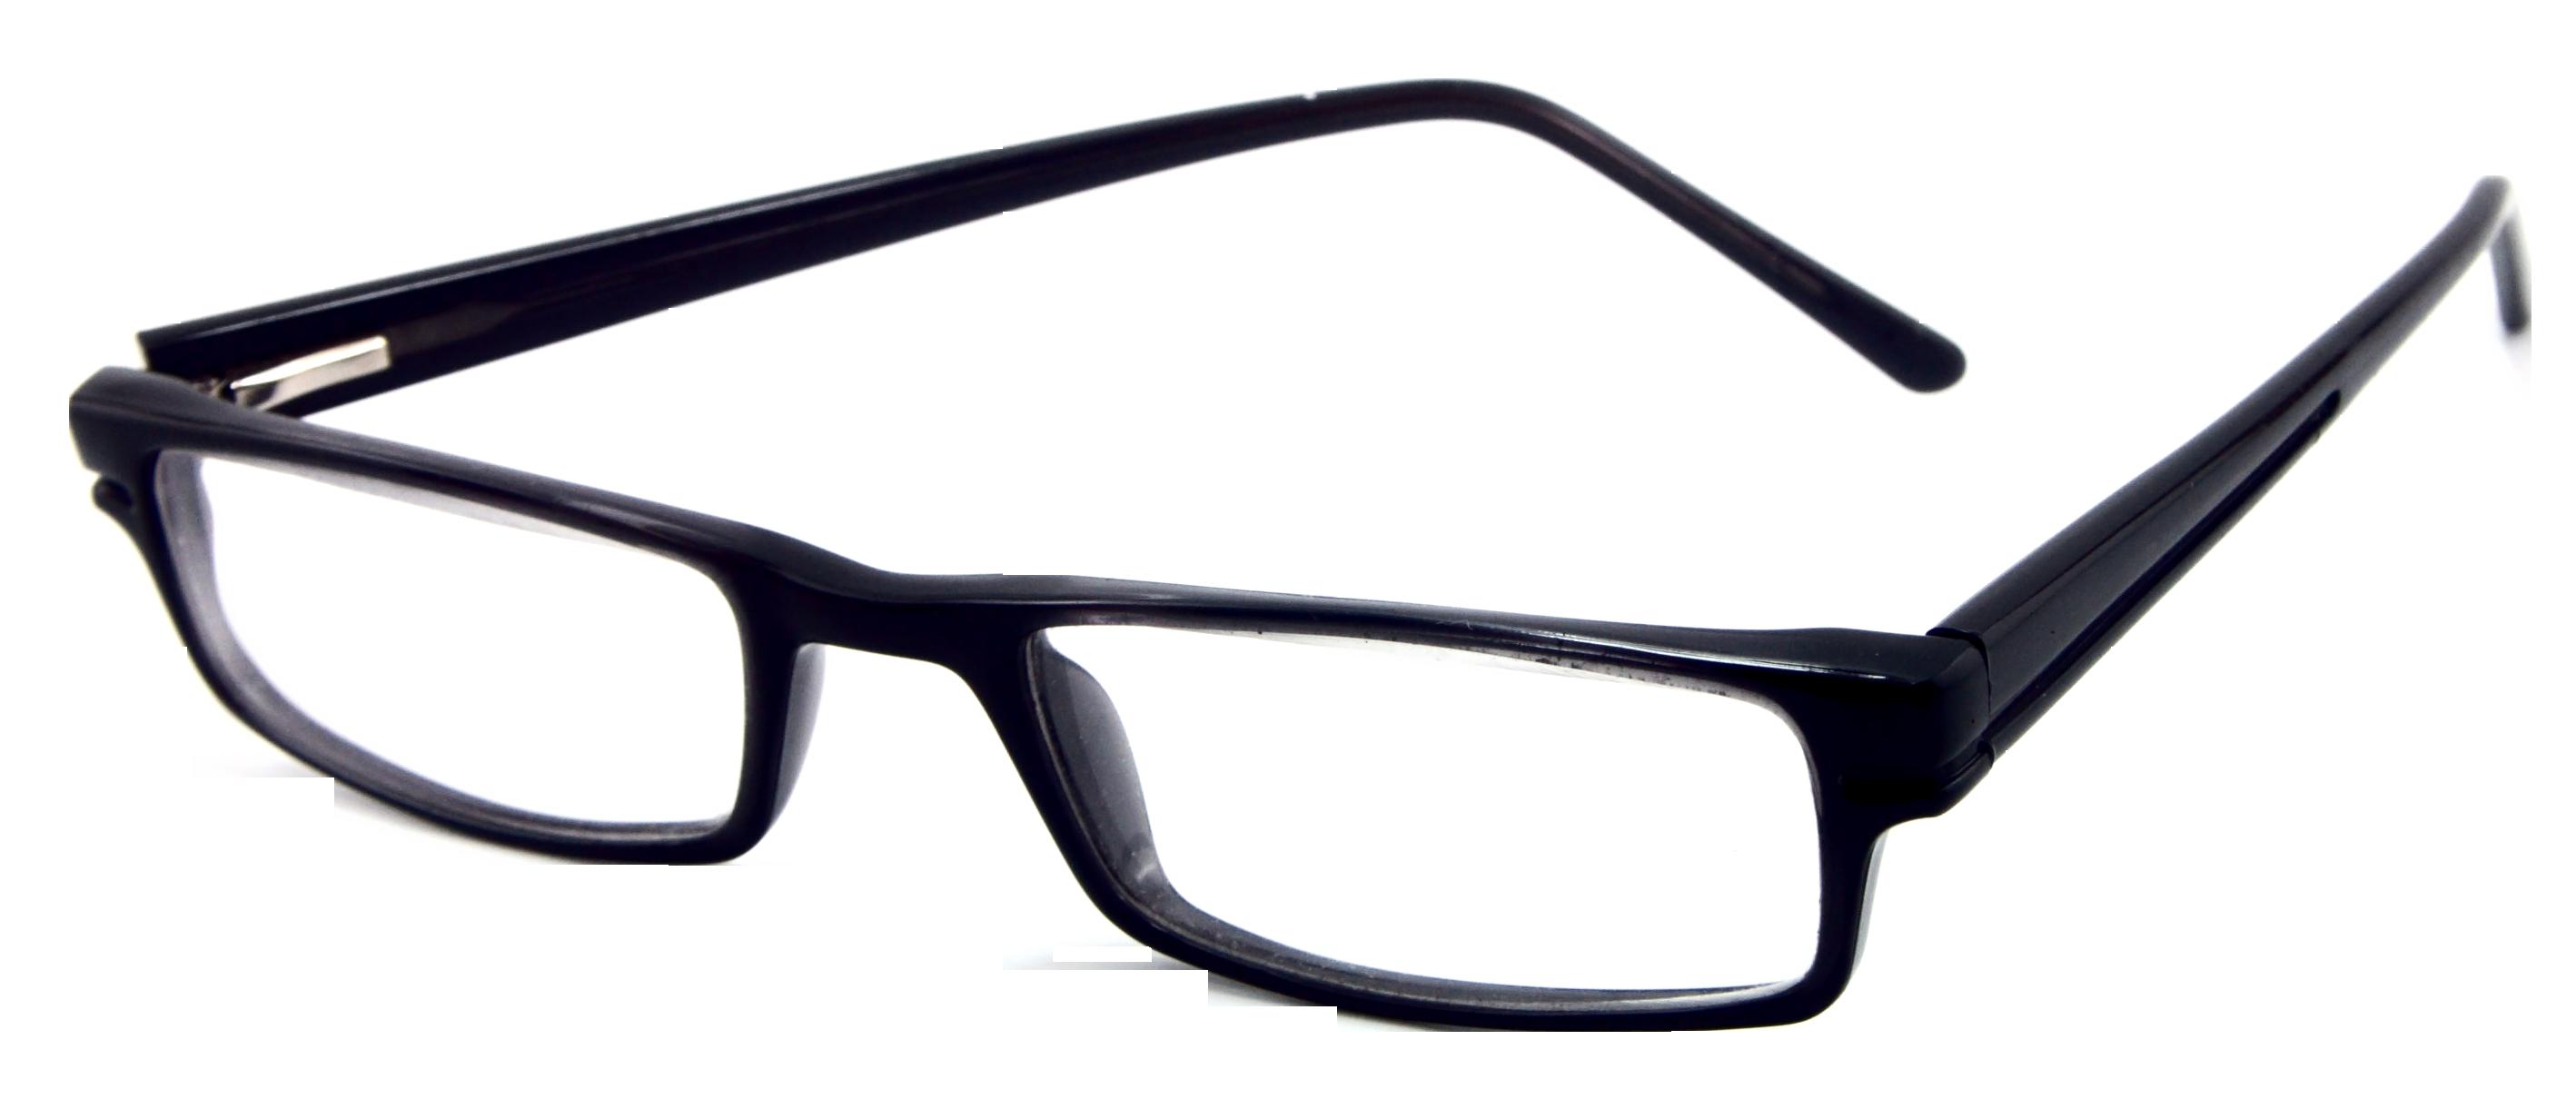 Sun glass cutout clipart jpg download Glasses PNG images, free glasses png images free download jpg download